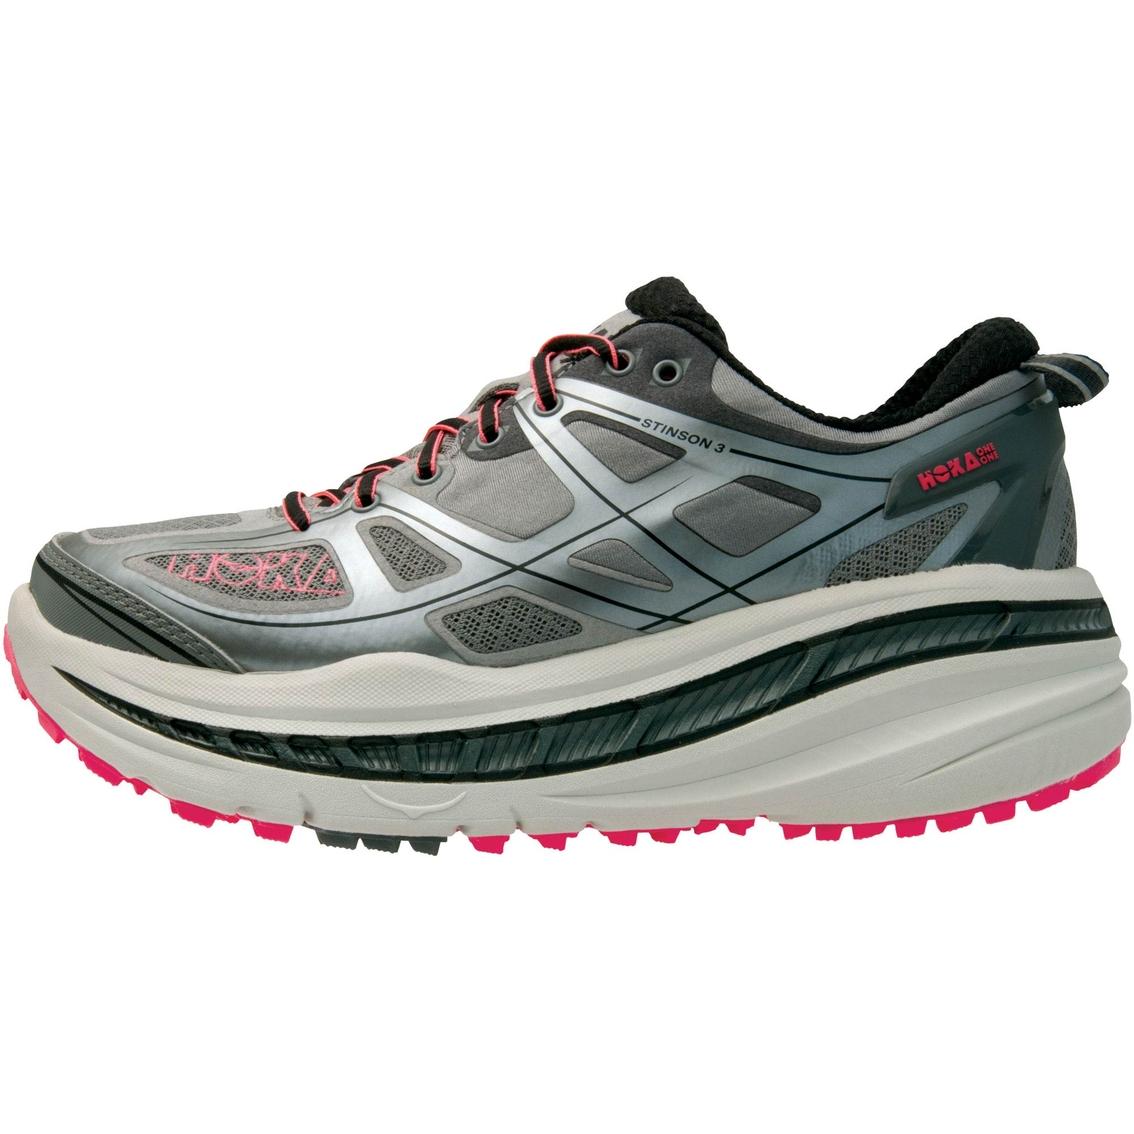 Hoka One One Women's Stinson 3 ATR Running Shoes